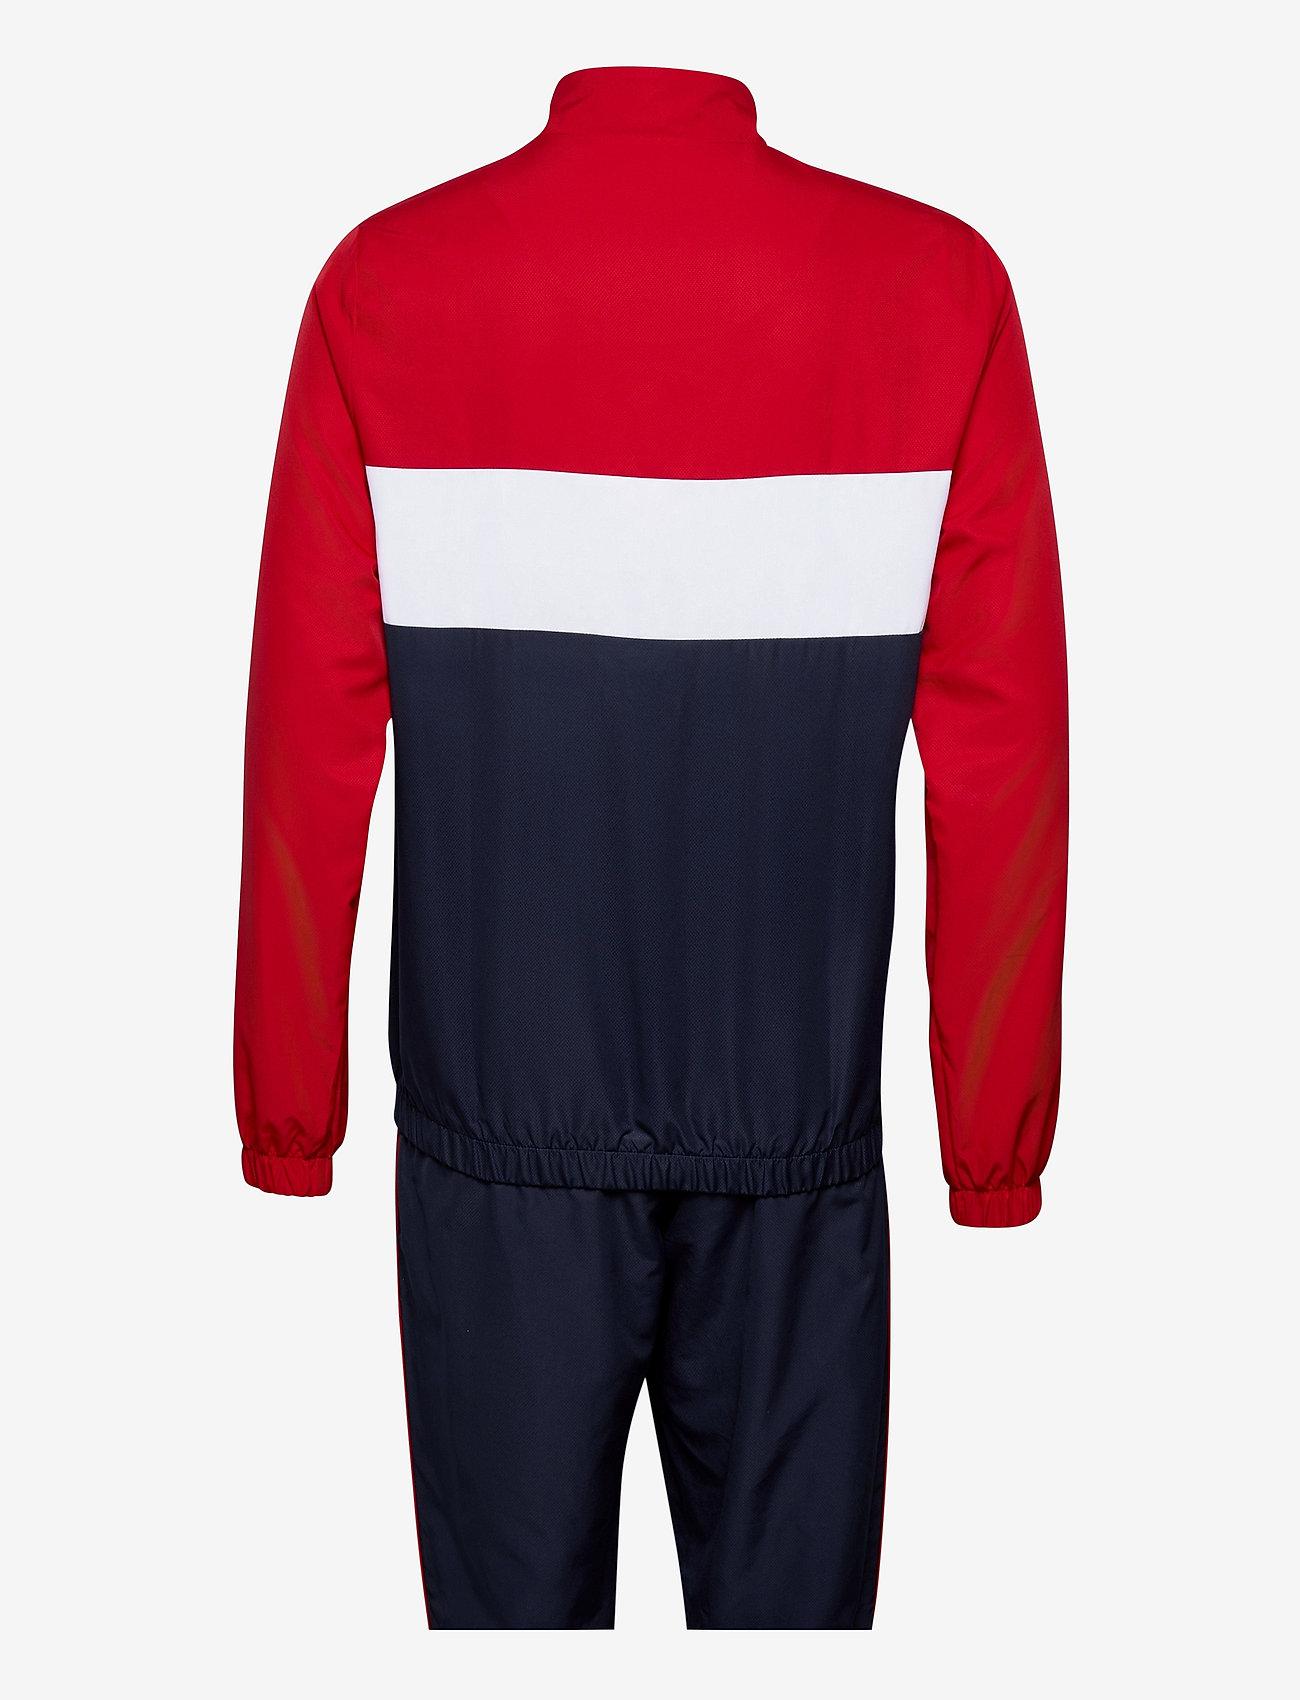 Lacoste - Men s tracksuit - dresy - ruby/navy blue-white - 1